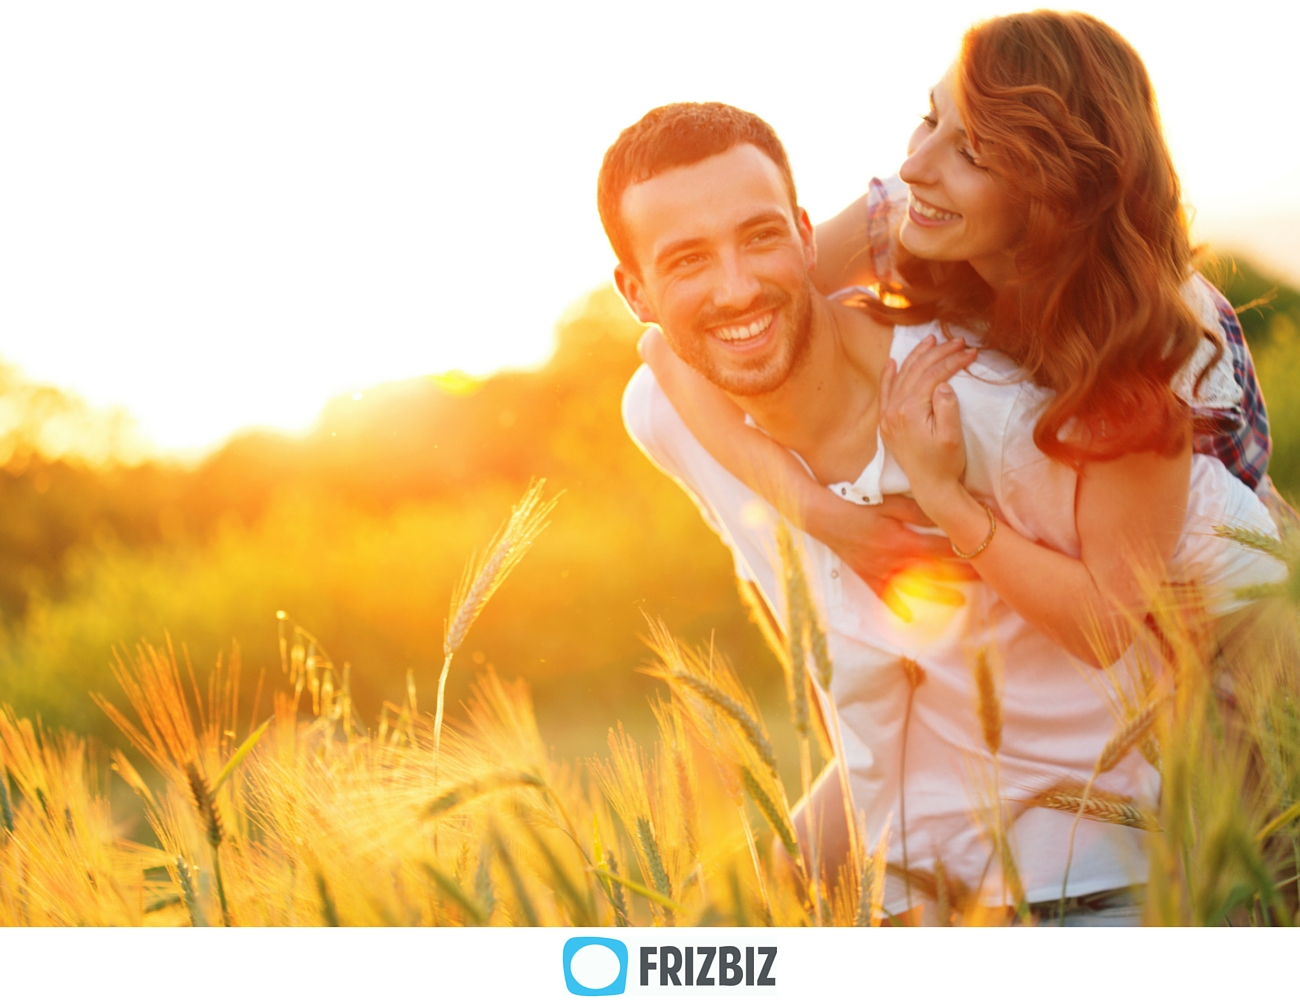 People_Frizbiz[1]